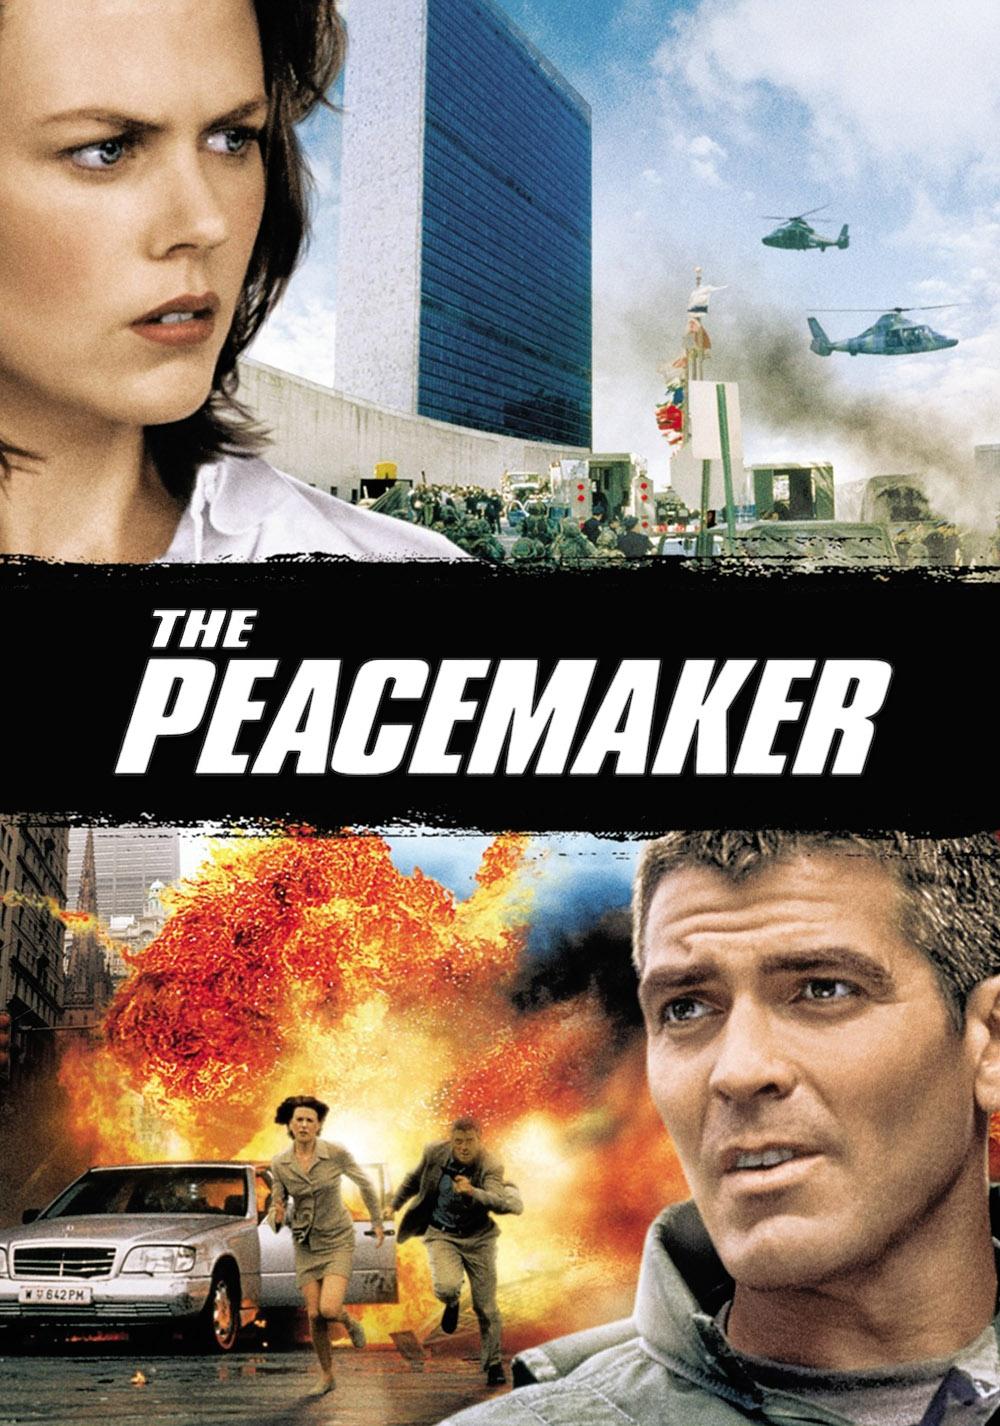 The Peacemaker (1997) พีซเมคเกอร์ หยุดนิวเคลียร์มหาภัยถล่มโลก